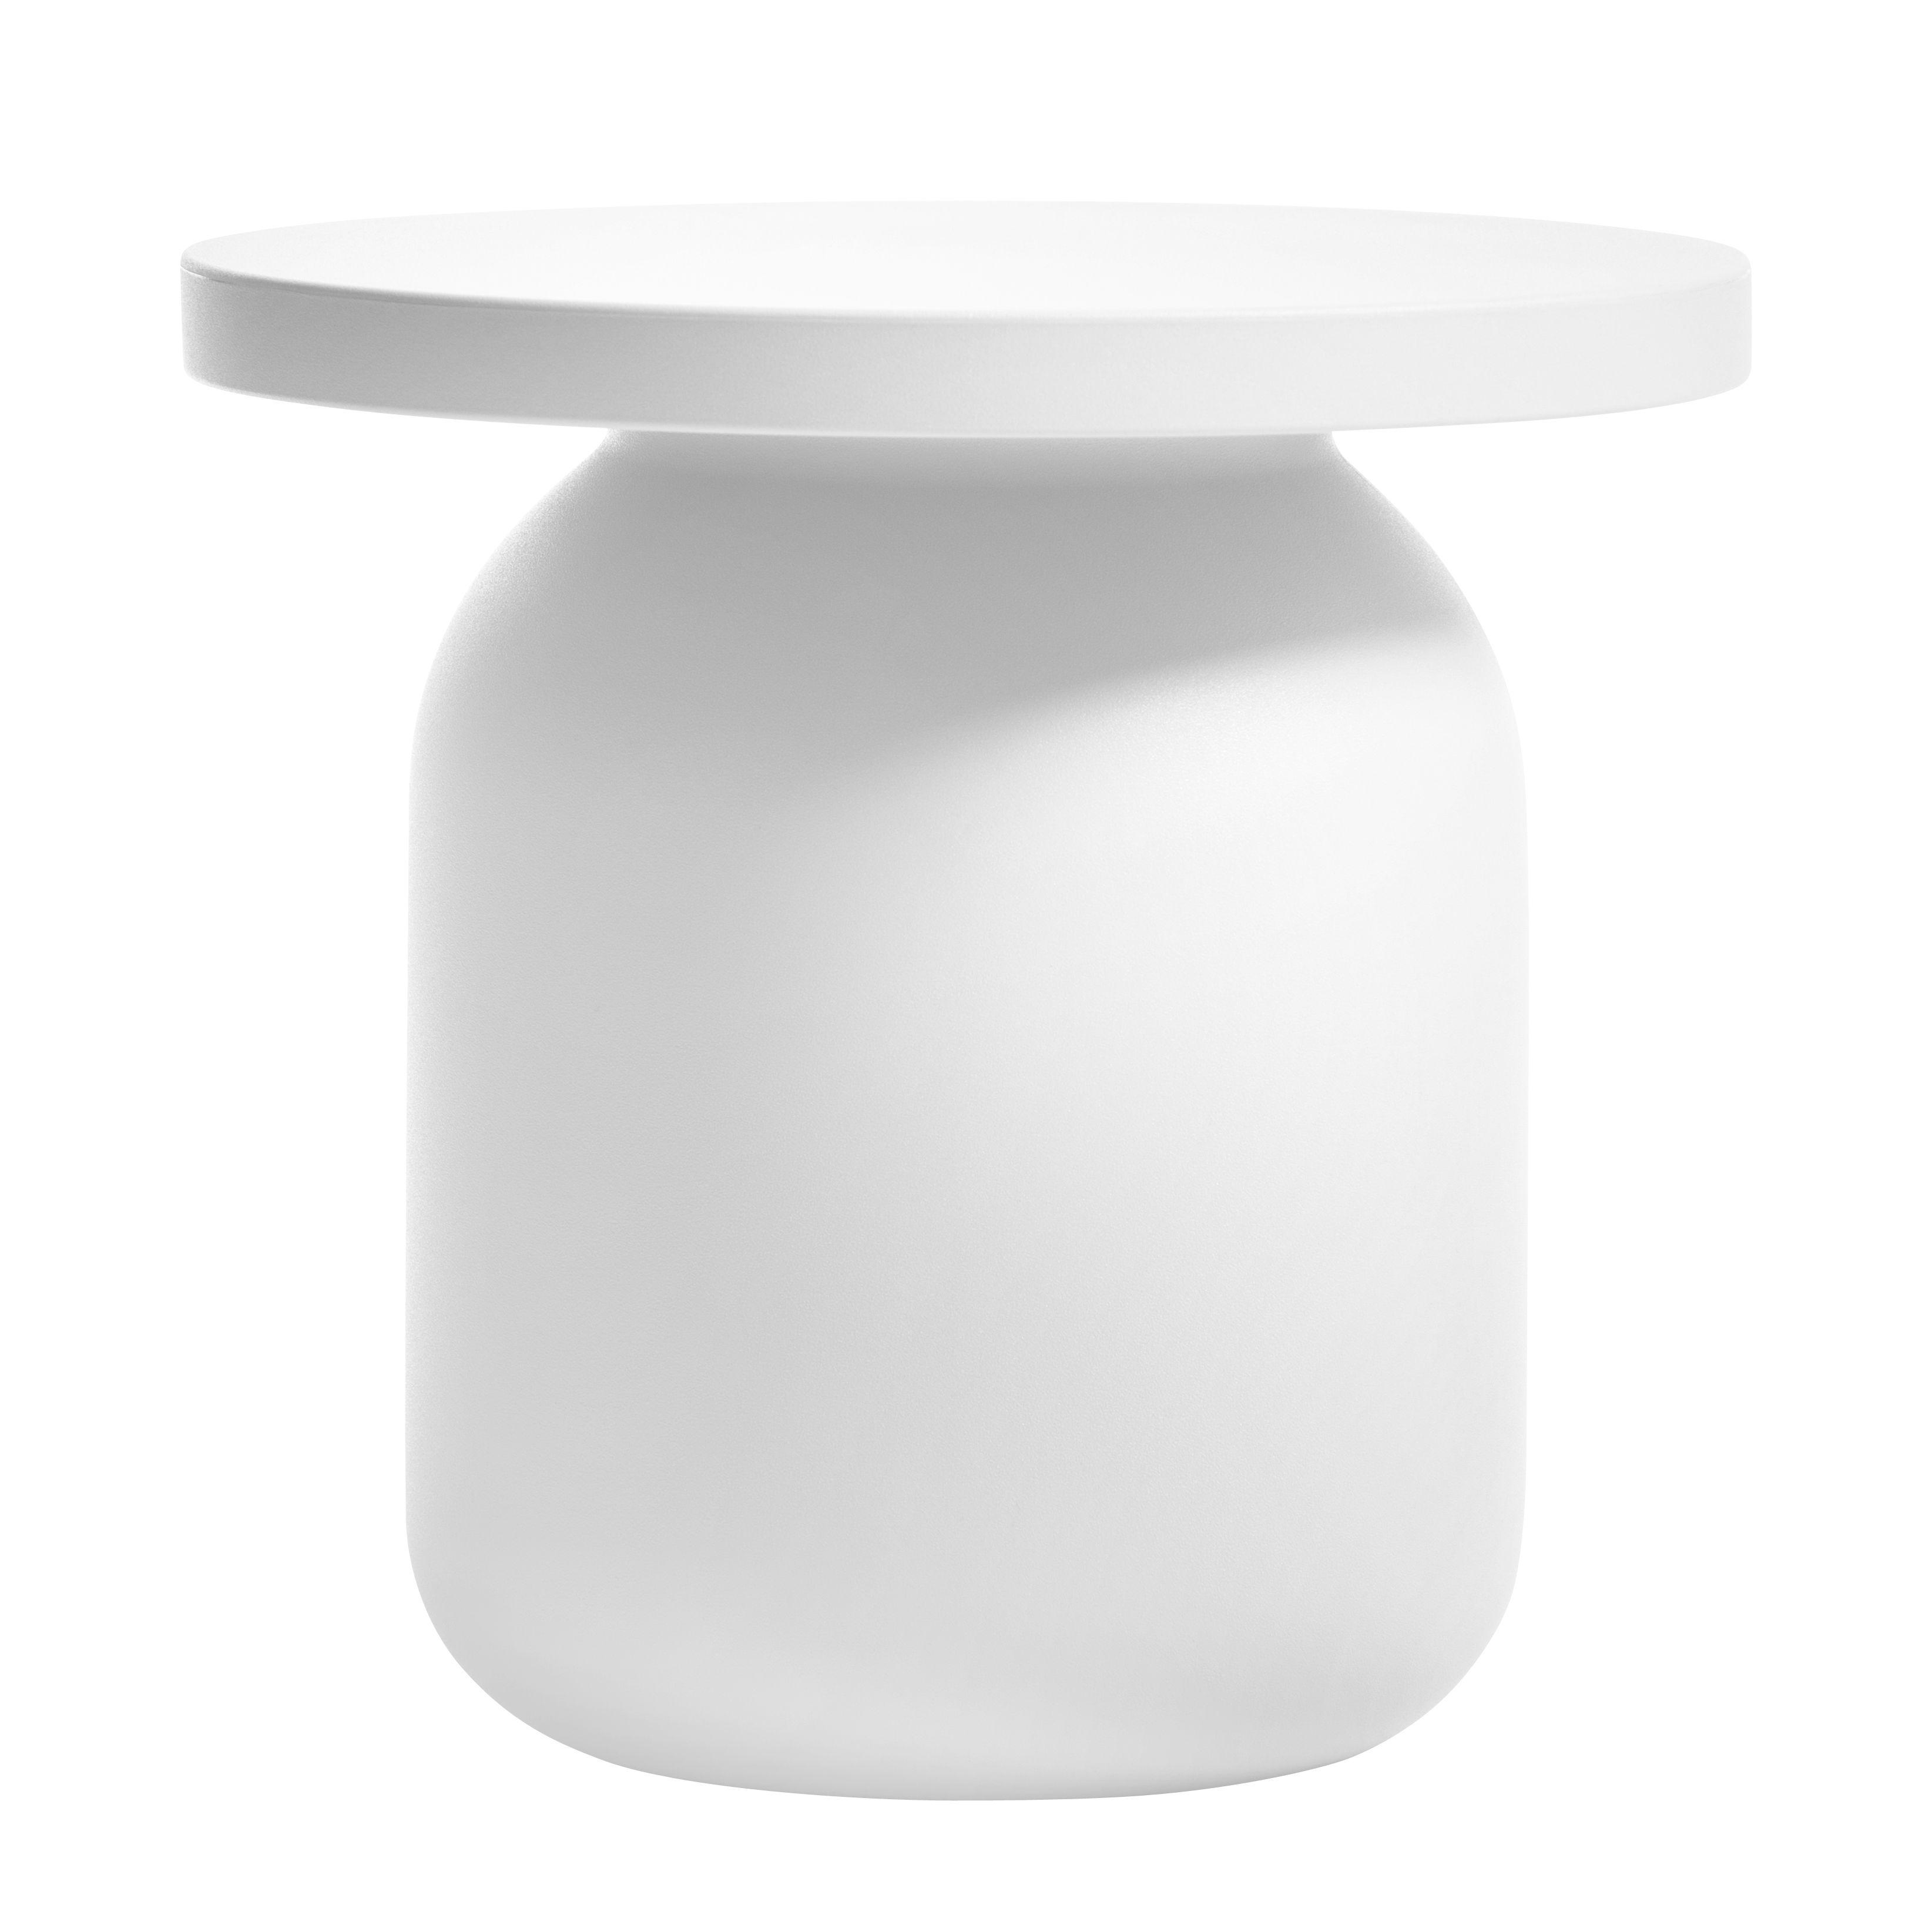 Furniture - Coffee Tables - Juju Luminous low stool - LED RGB - Wireless by Serralunga - White - Polythene